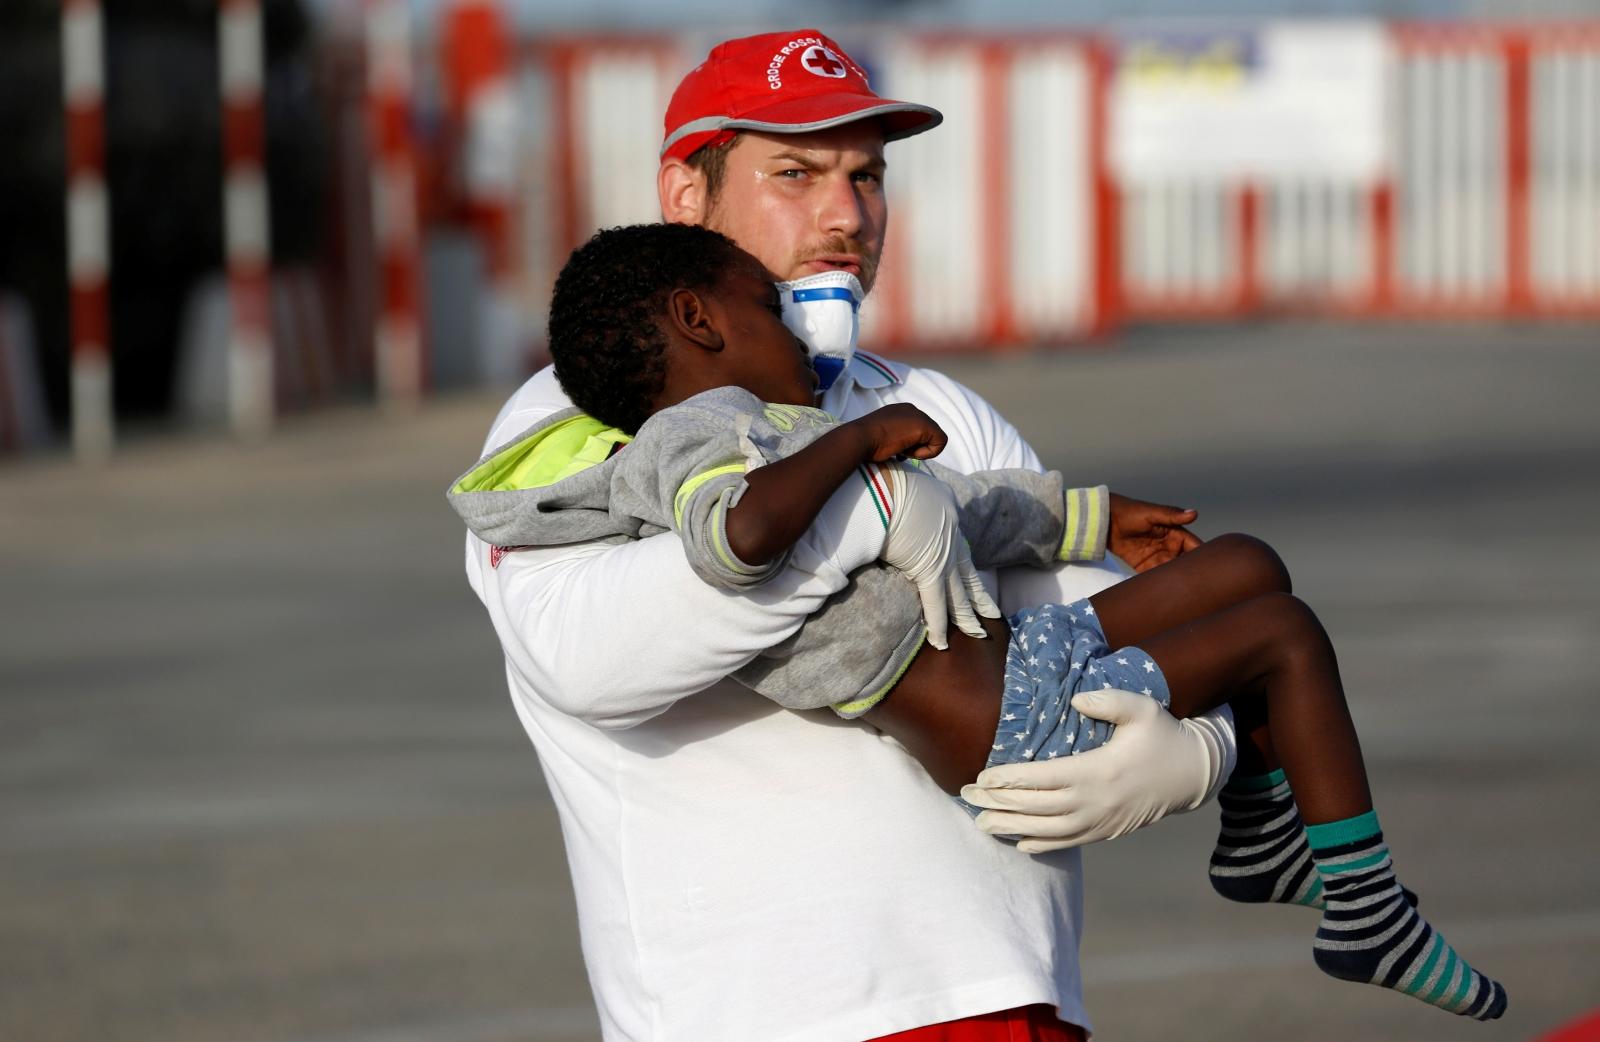 Mediterranean migrants libya italy 2016